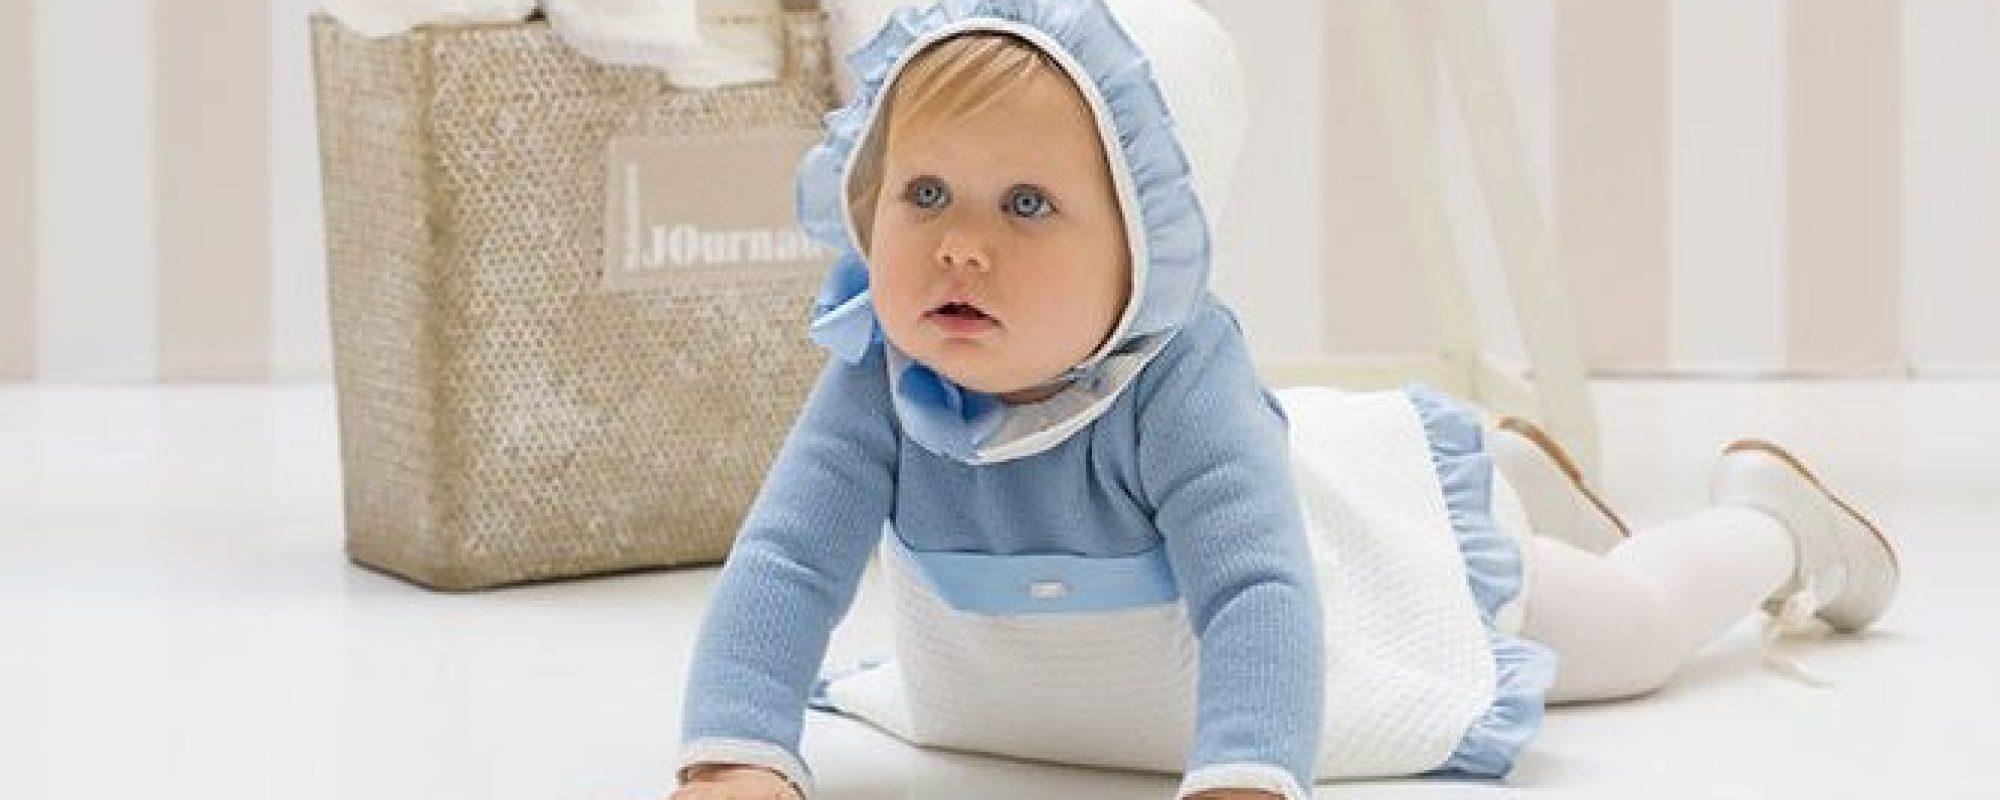 yoedu-invierno-moda-infantil-bebe-11